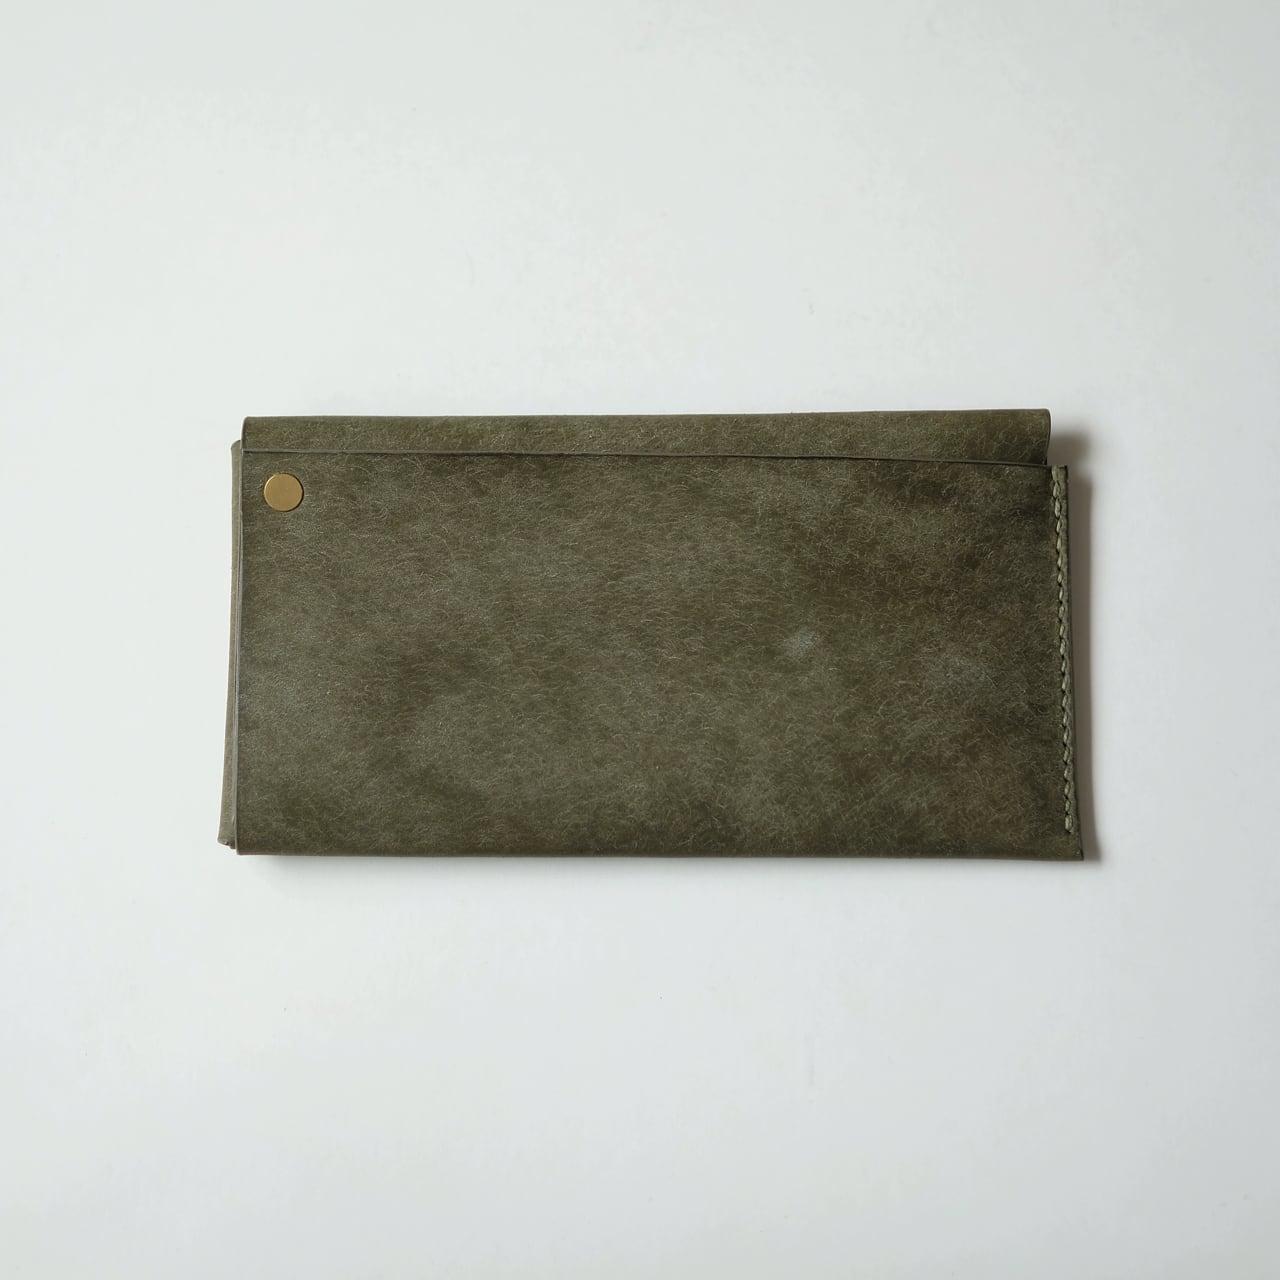 square long wallet - gri - プエブロ